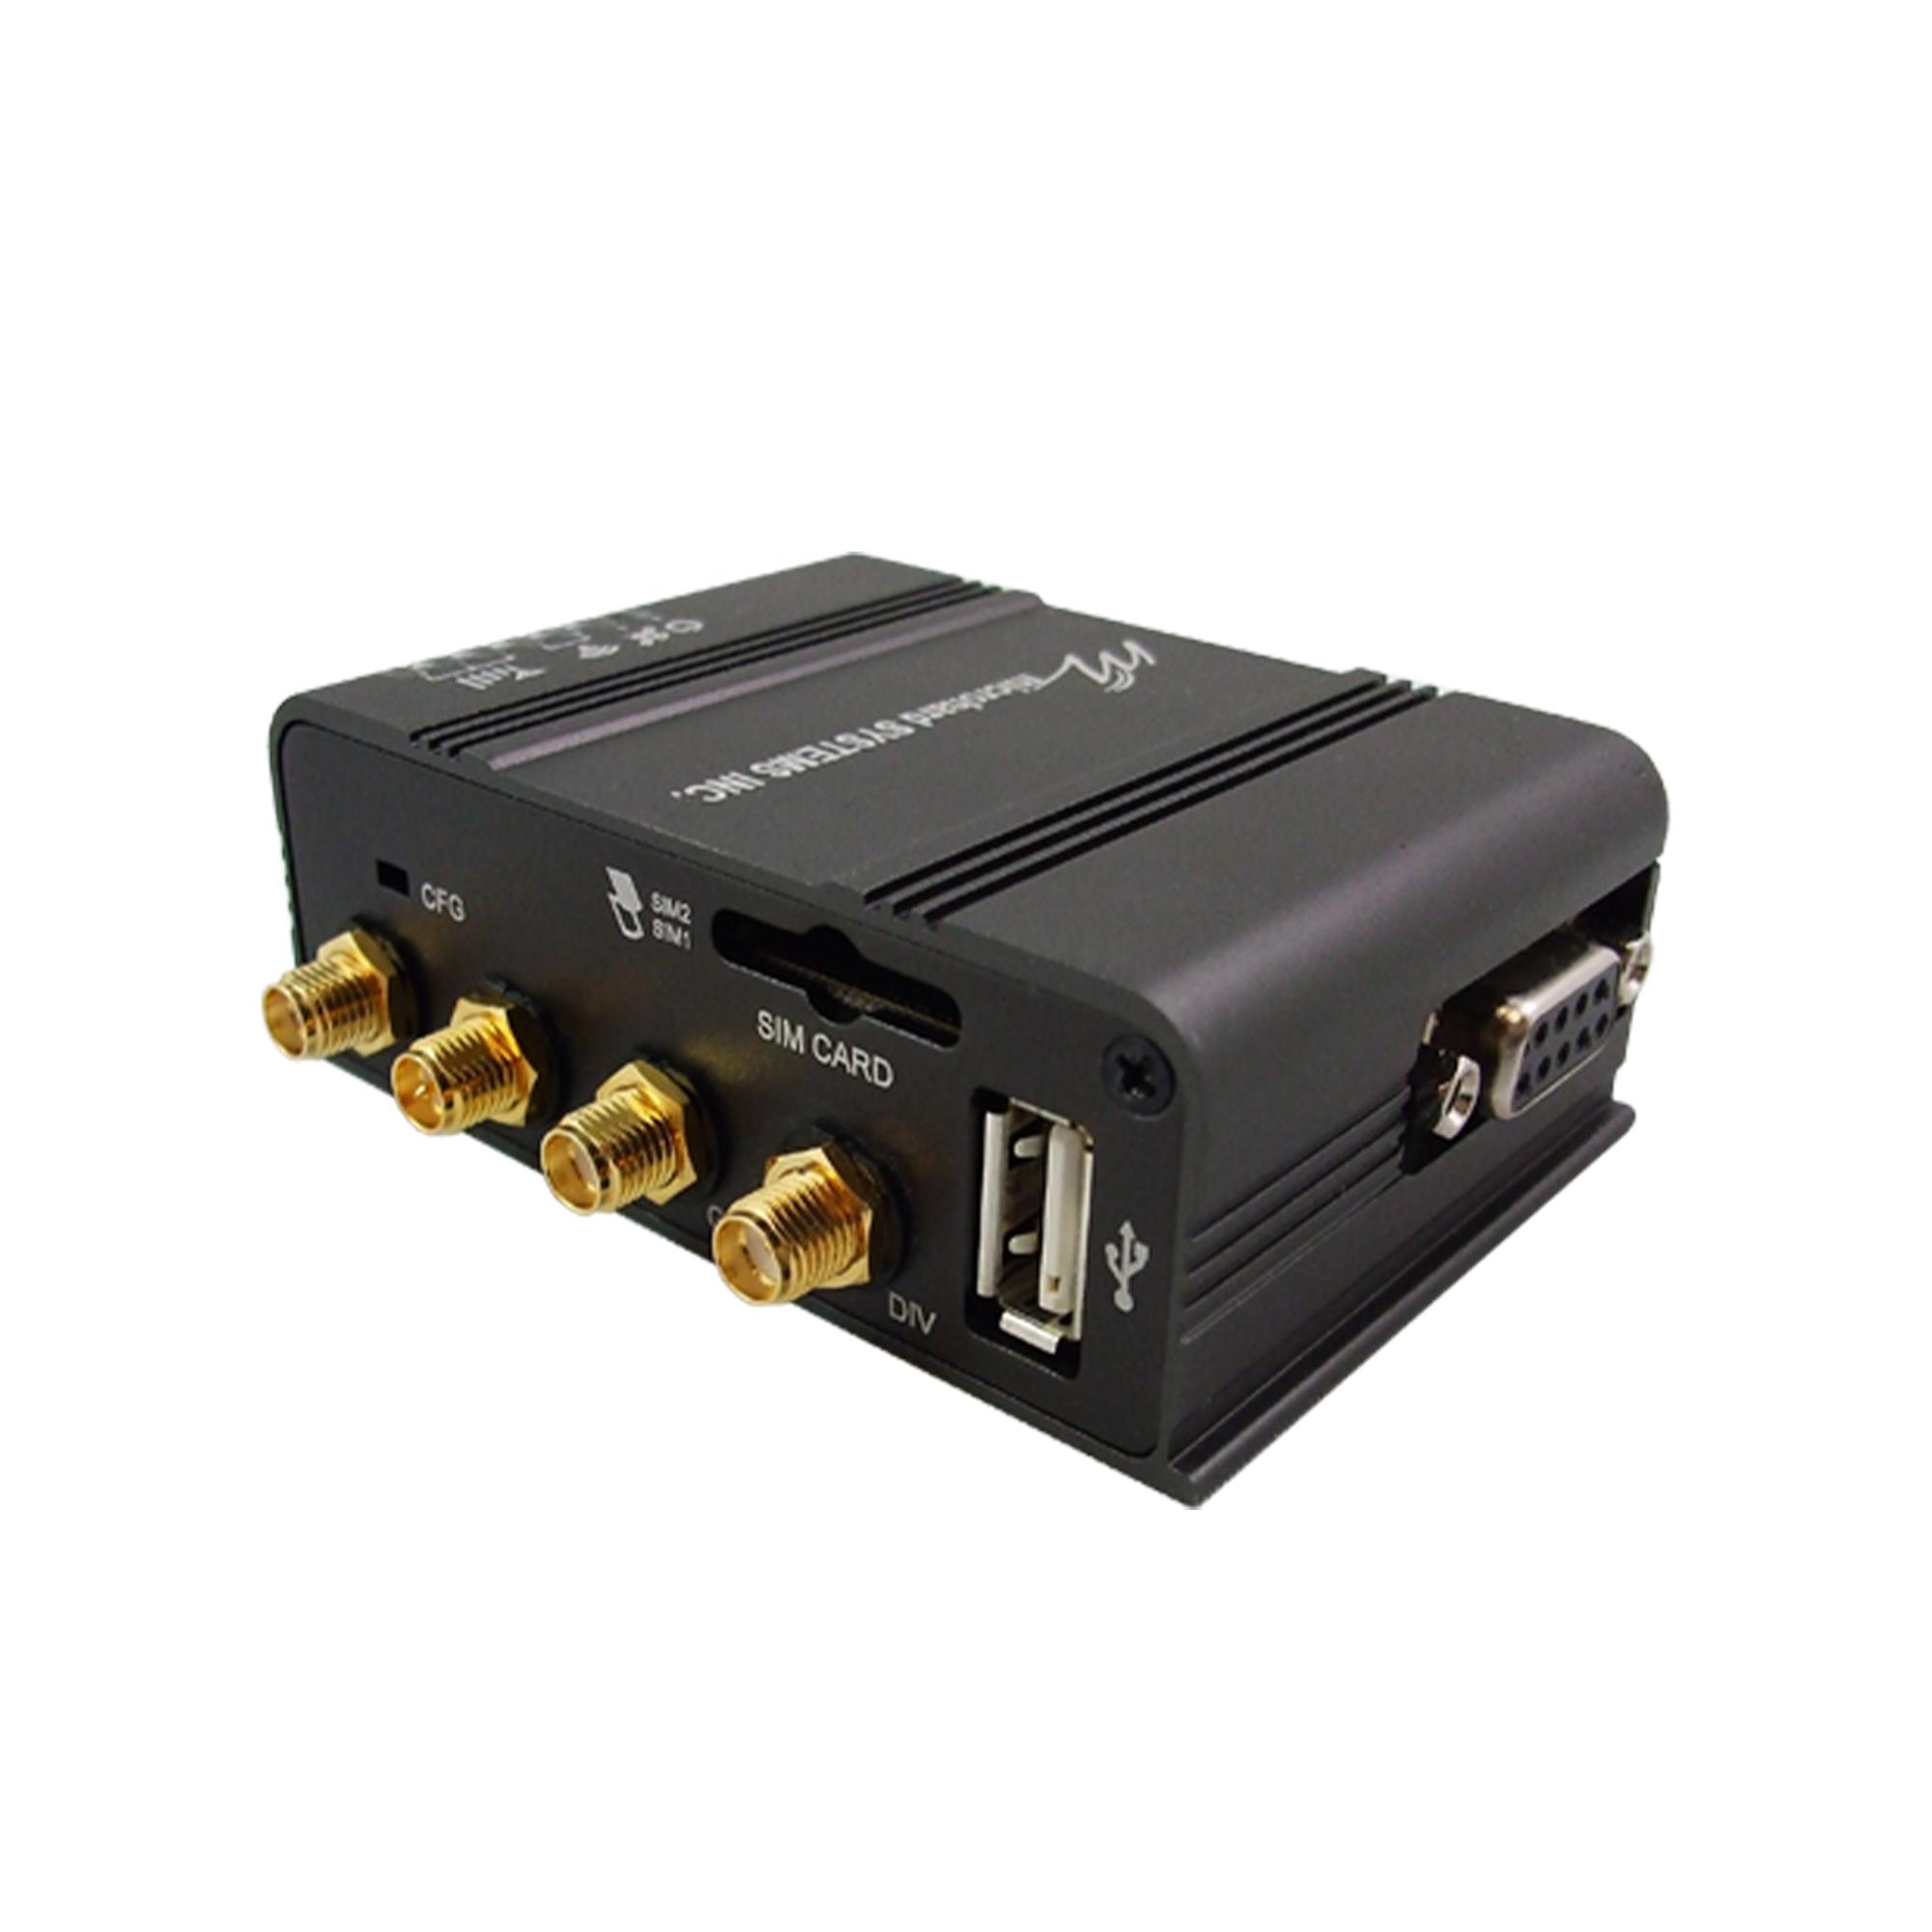 BulletPlus-NA2-4G-LTE Ethernet Serial Gateway+WIFI CA-MHS117504_BACK 2000px